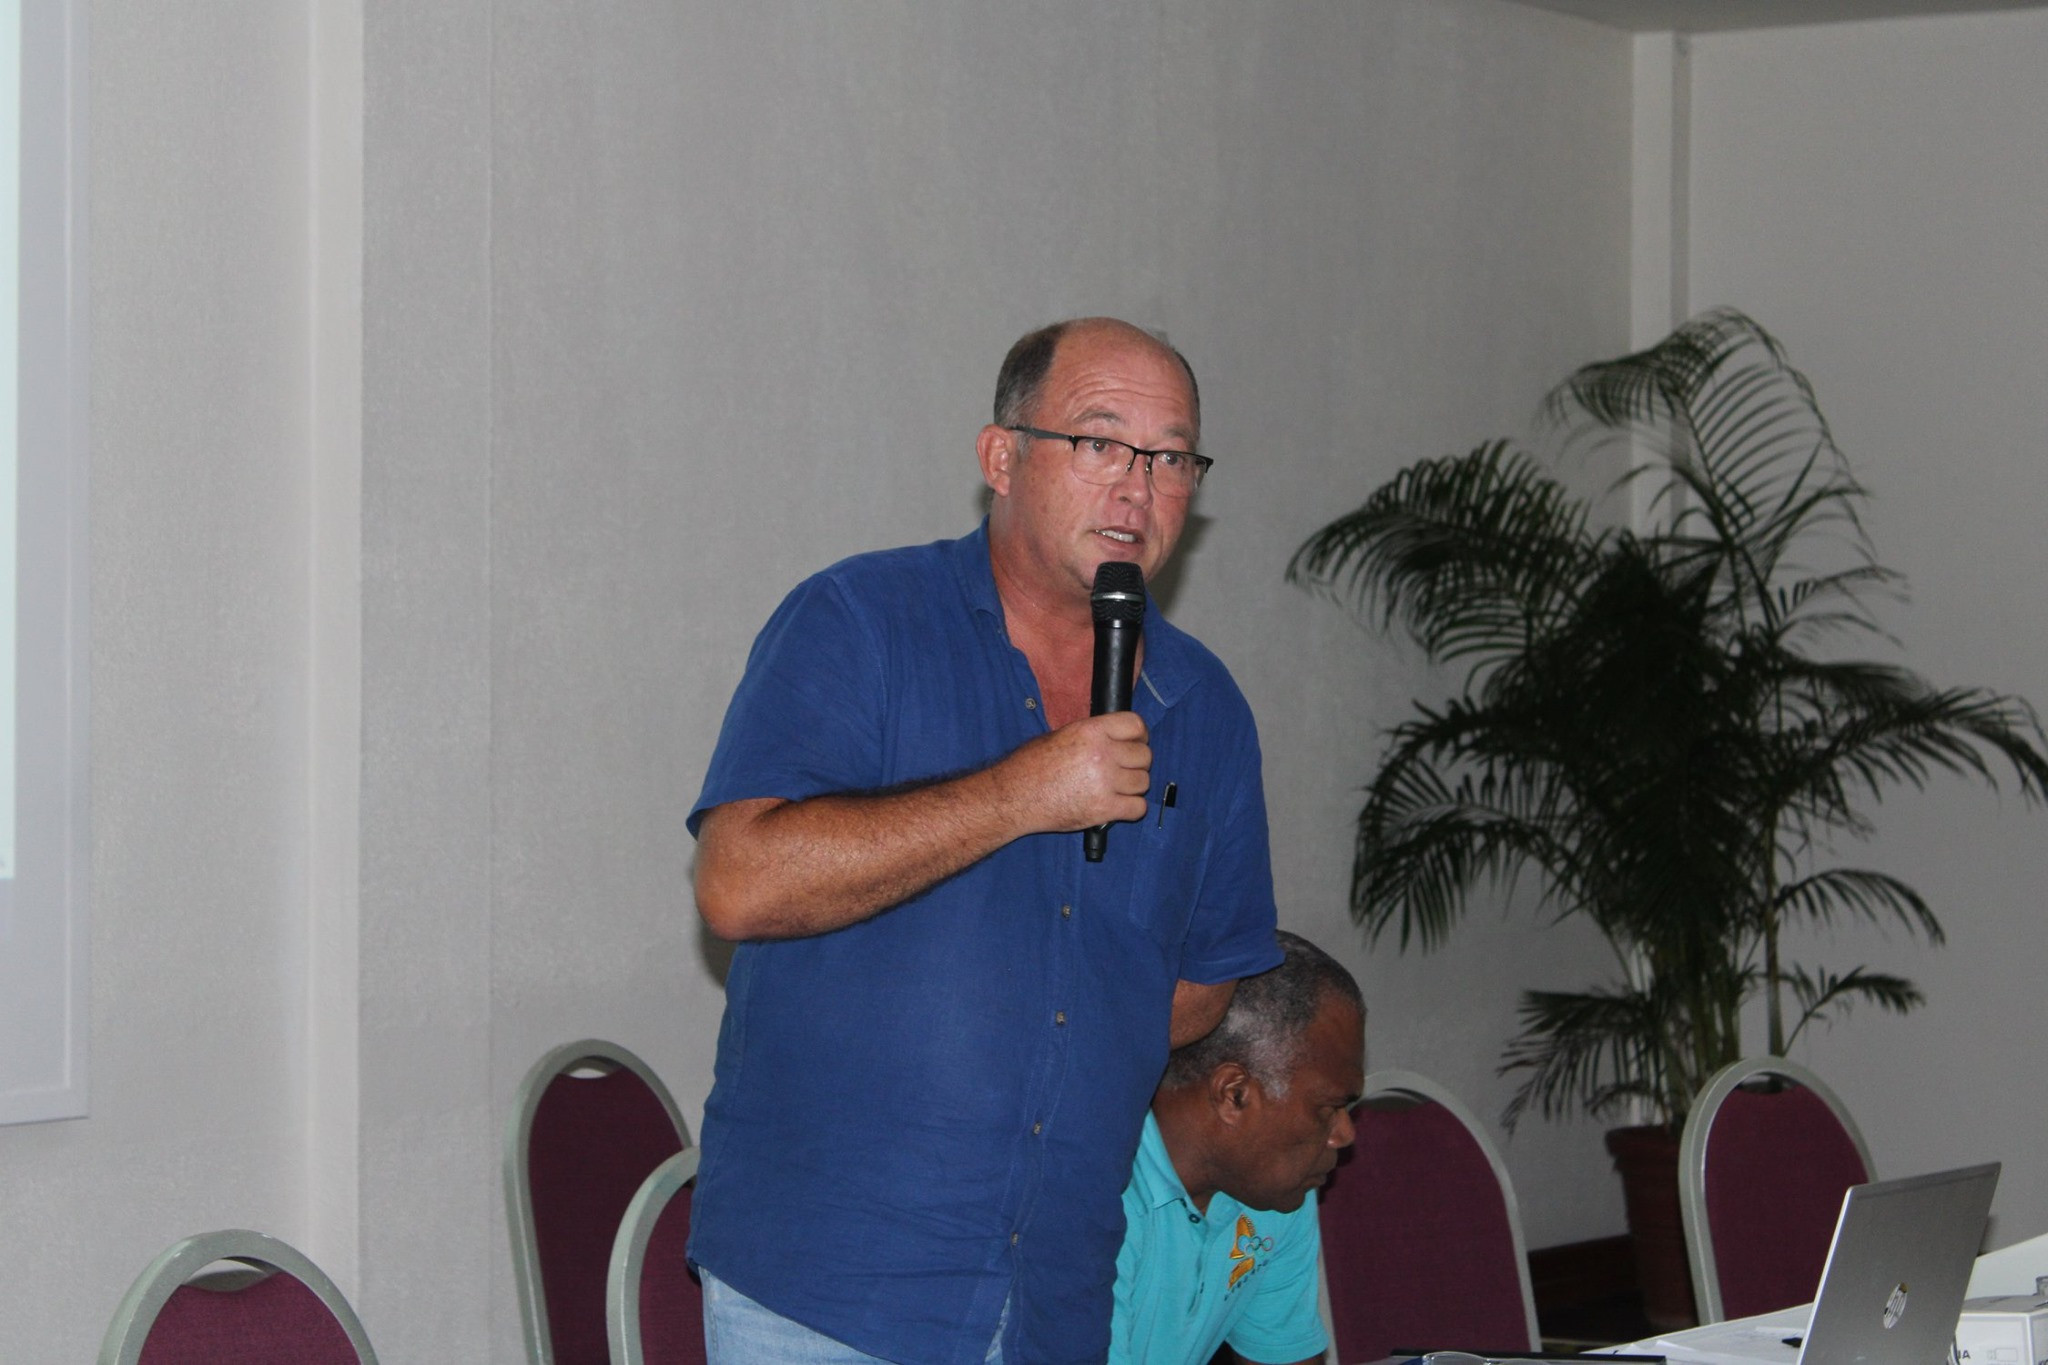 Antoine Boudier was re-elected as VASANOC President ©VASANOC